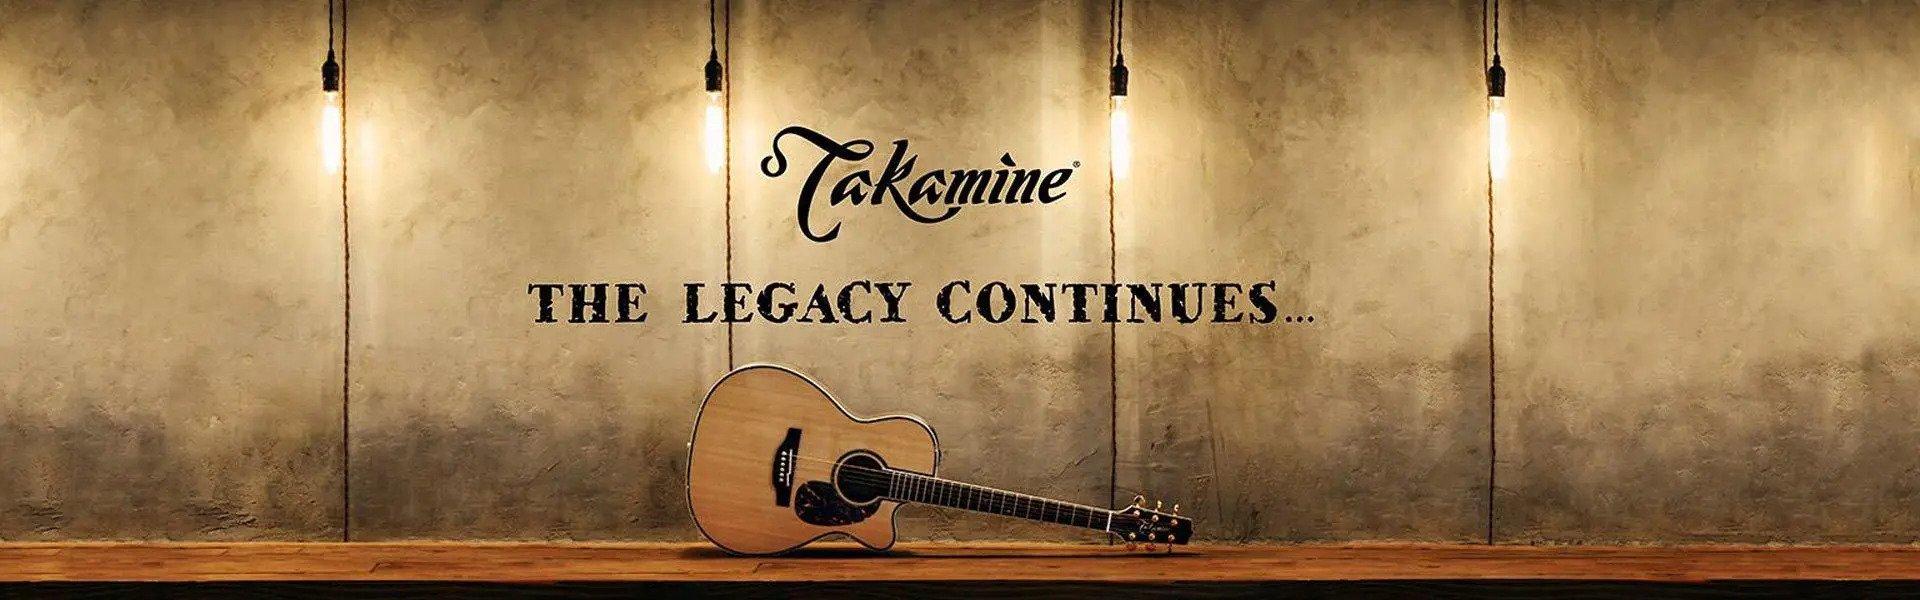 Takamine Banner 1920x600 1 - Takamine GC3 Series Acoustic Classical Guitar (TGC3NAT)